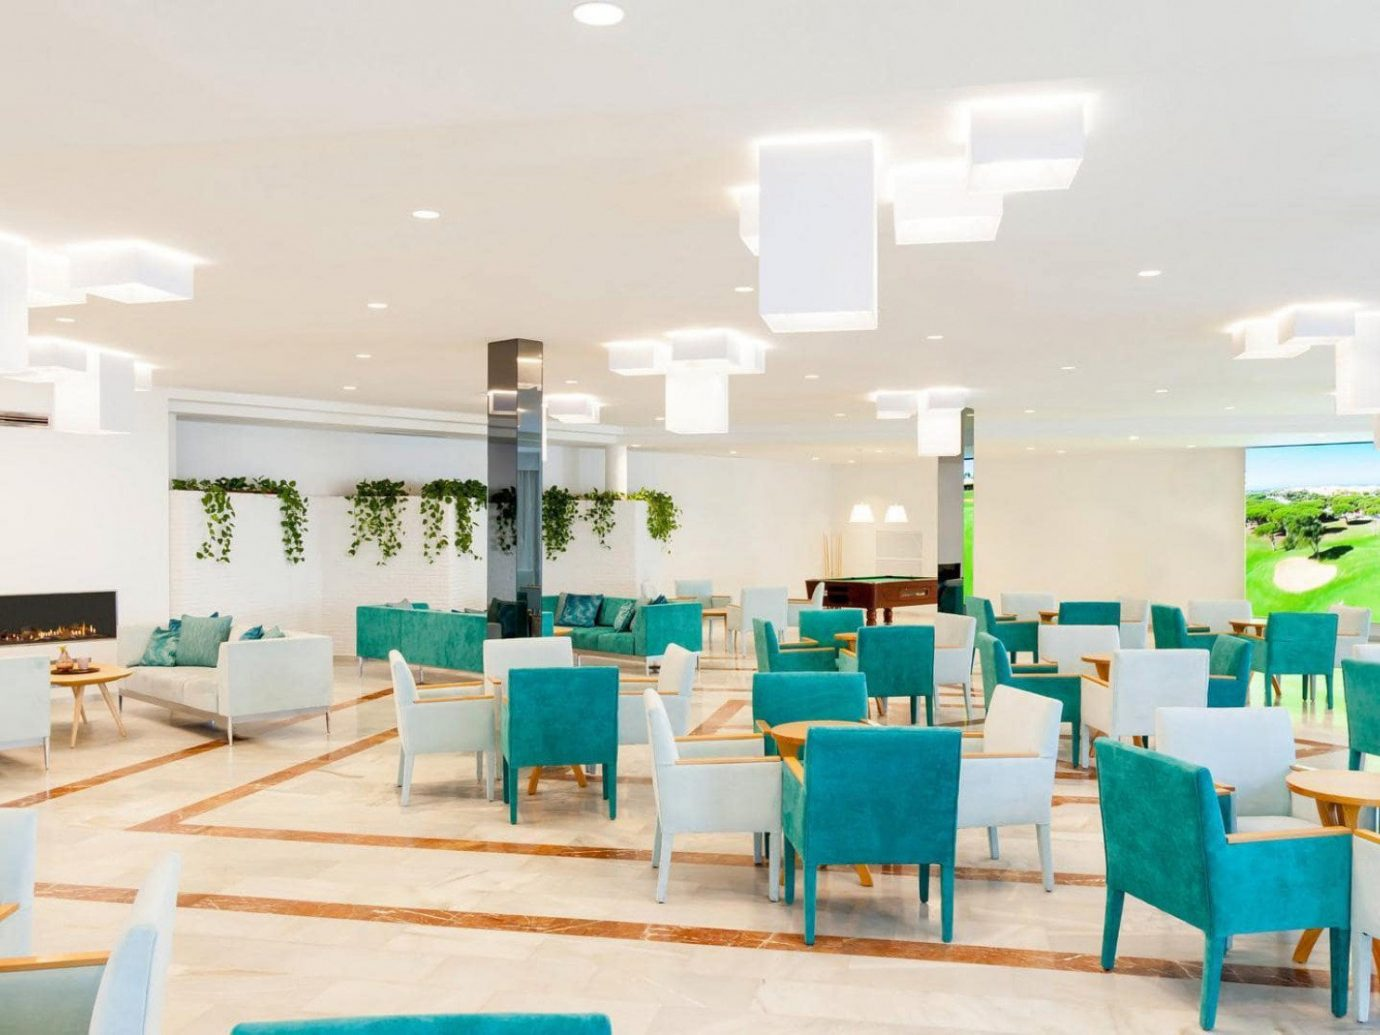 All-Inclusive Resorts Hotels floor indoor room chair Living interior design table furniture restaurant product design ceiling interior designer daylighting